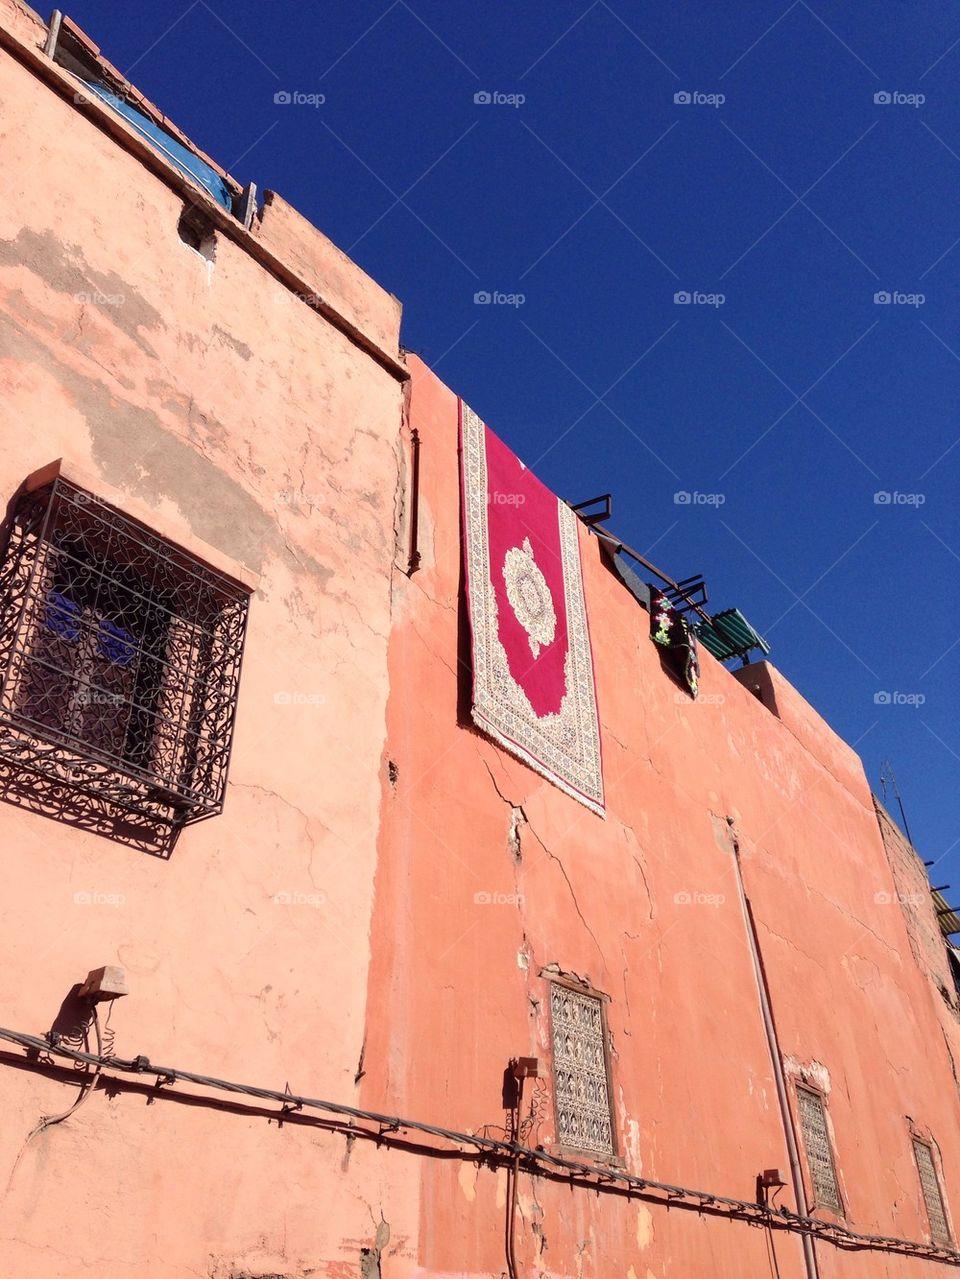 Rug Hanging in the Medina